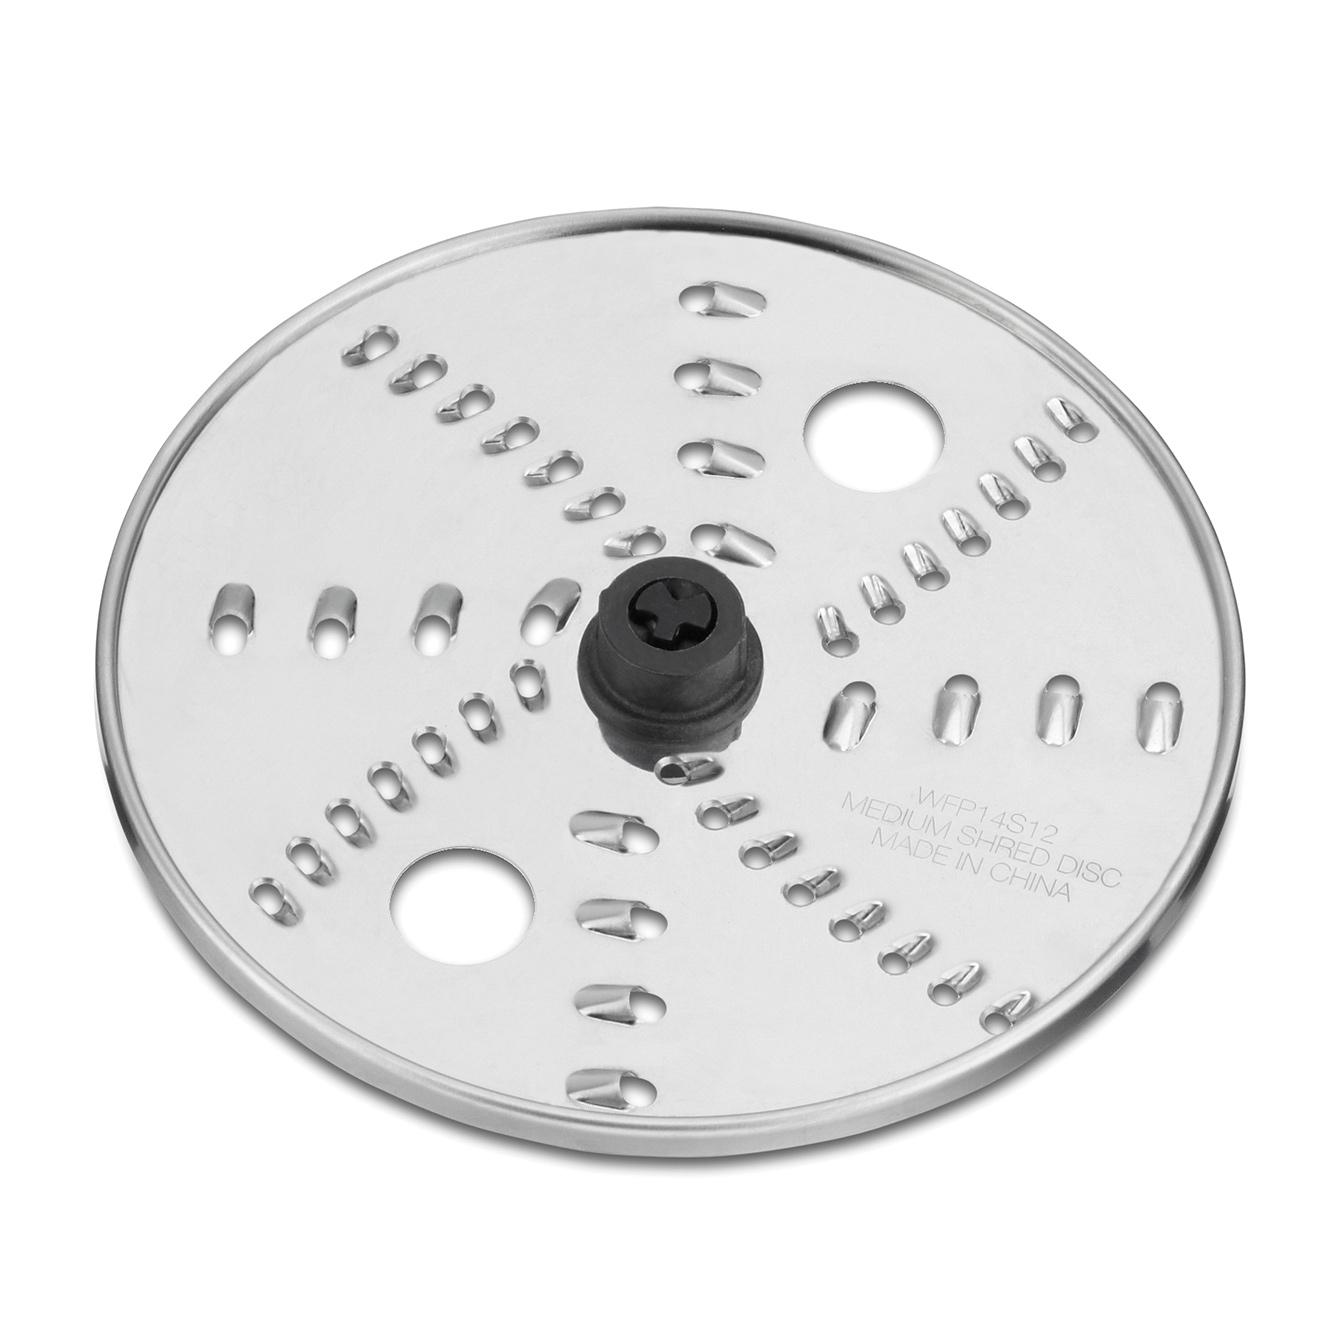 Waring WFP14S12 food processor, disc plate, shredding / grating